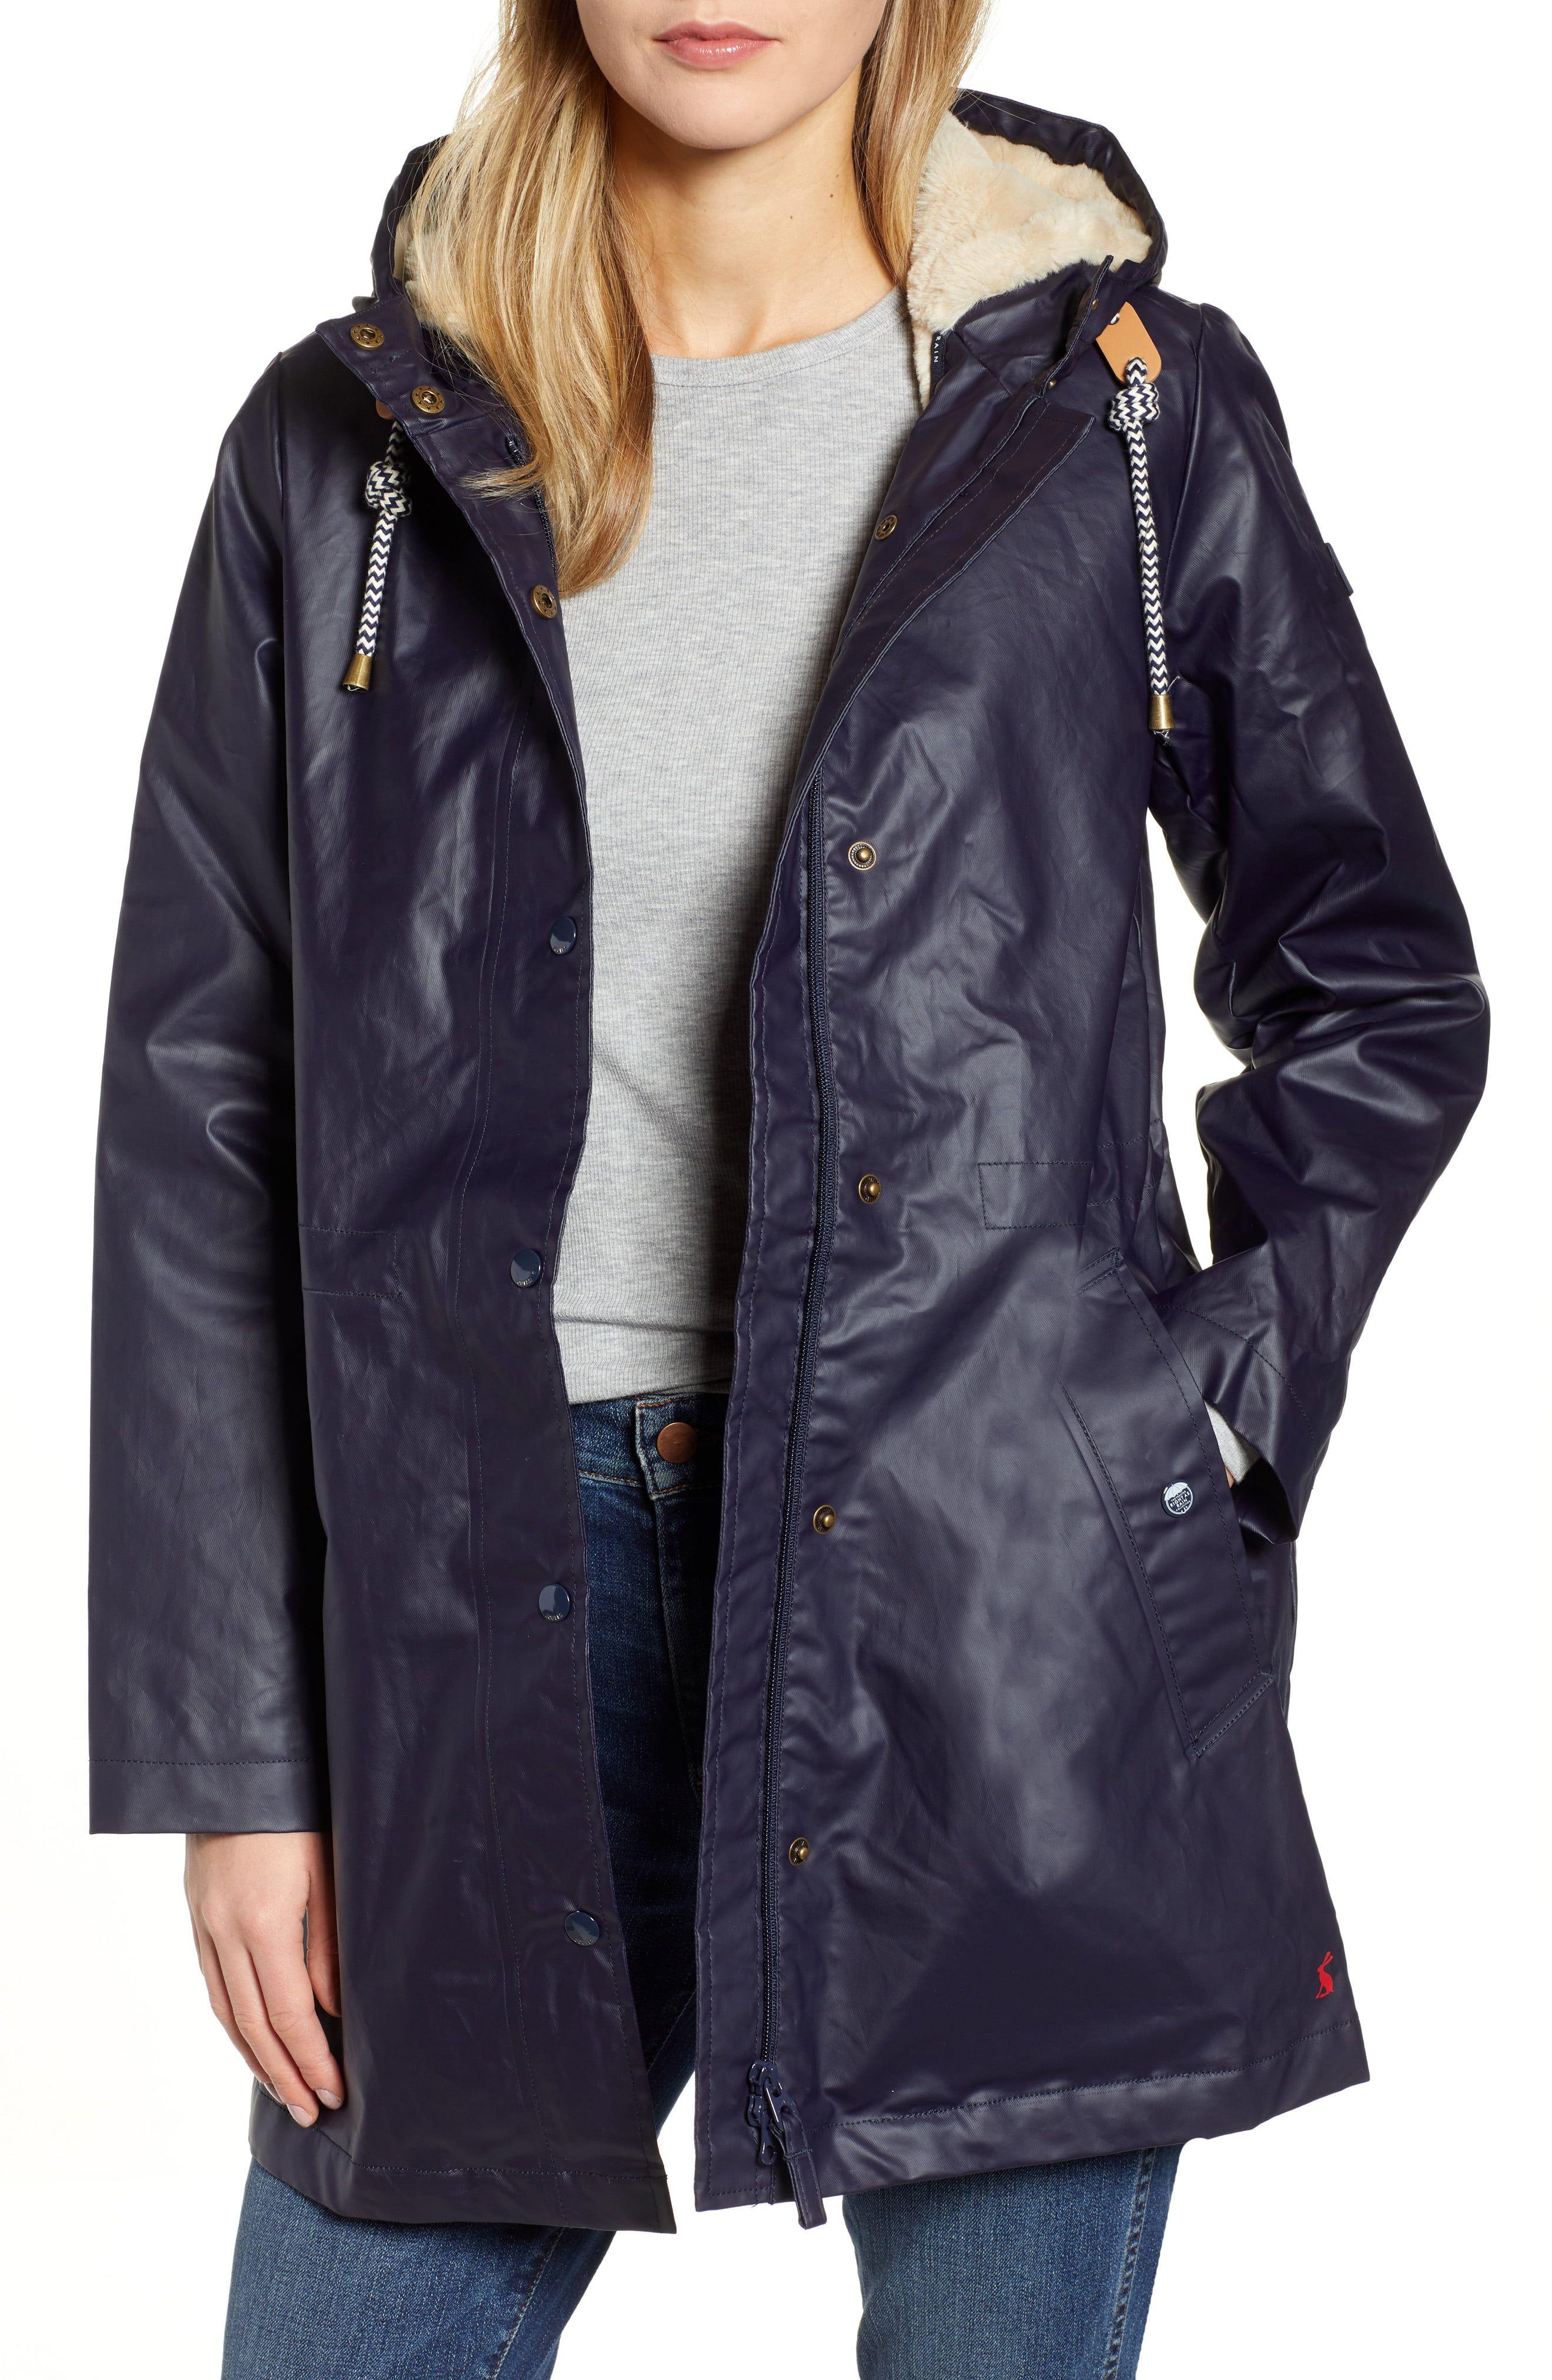 Joules Women/'s Rainaway Waterproof Coat Half Teddy Fur Lining Large Pockets